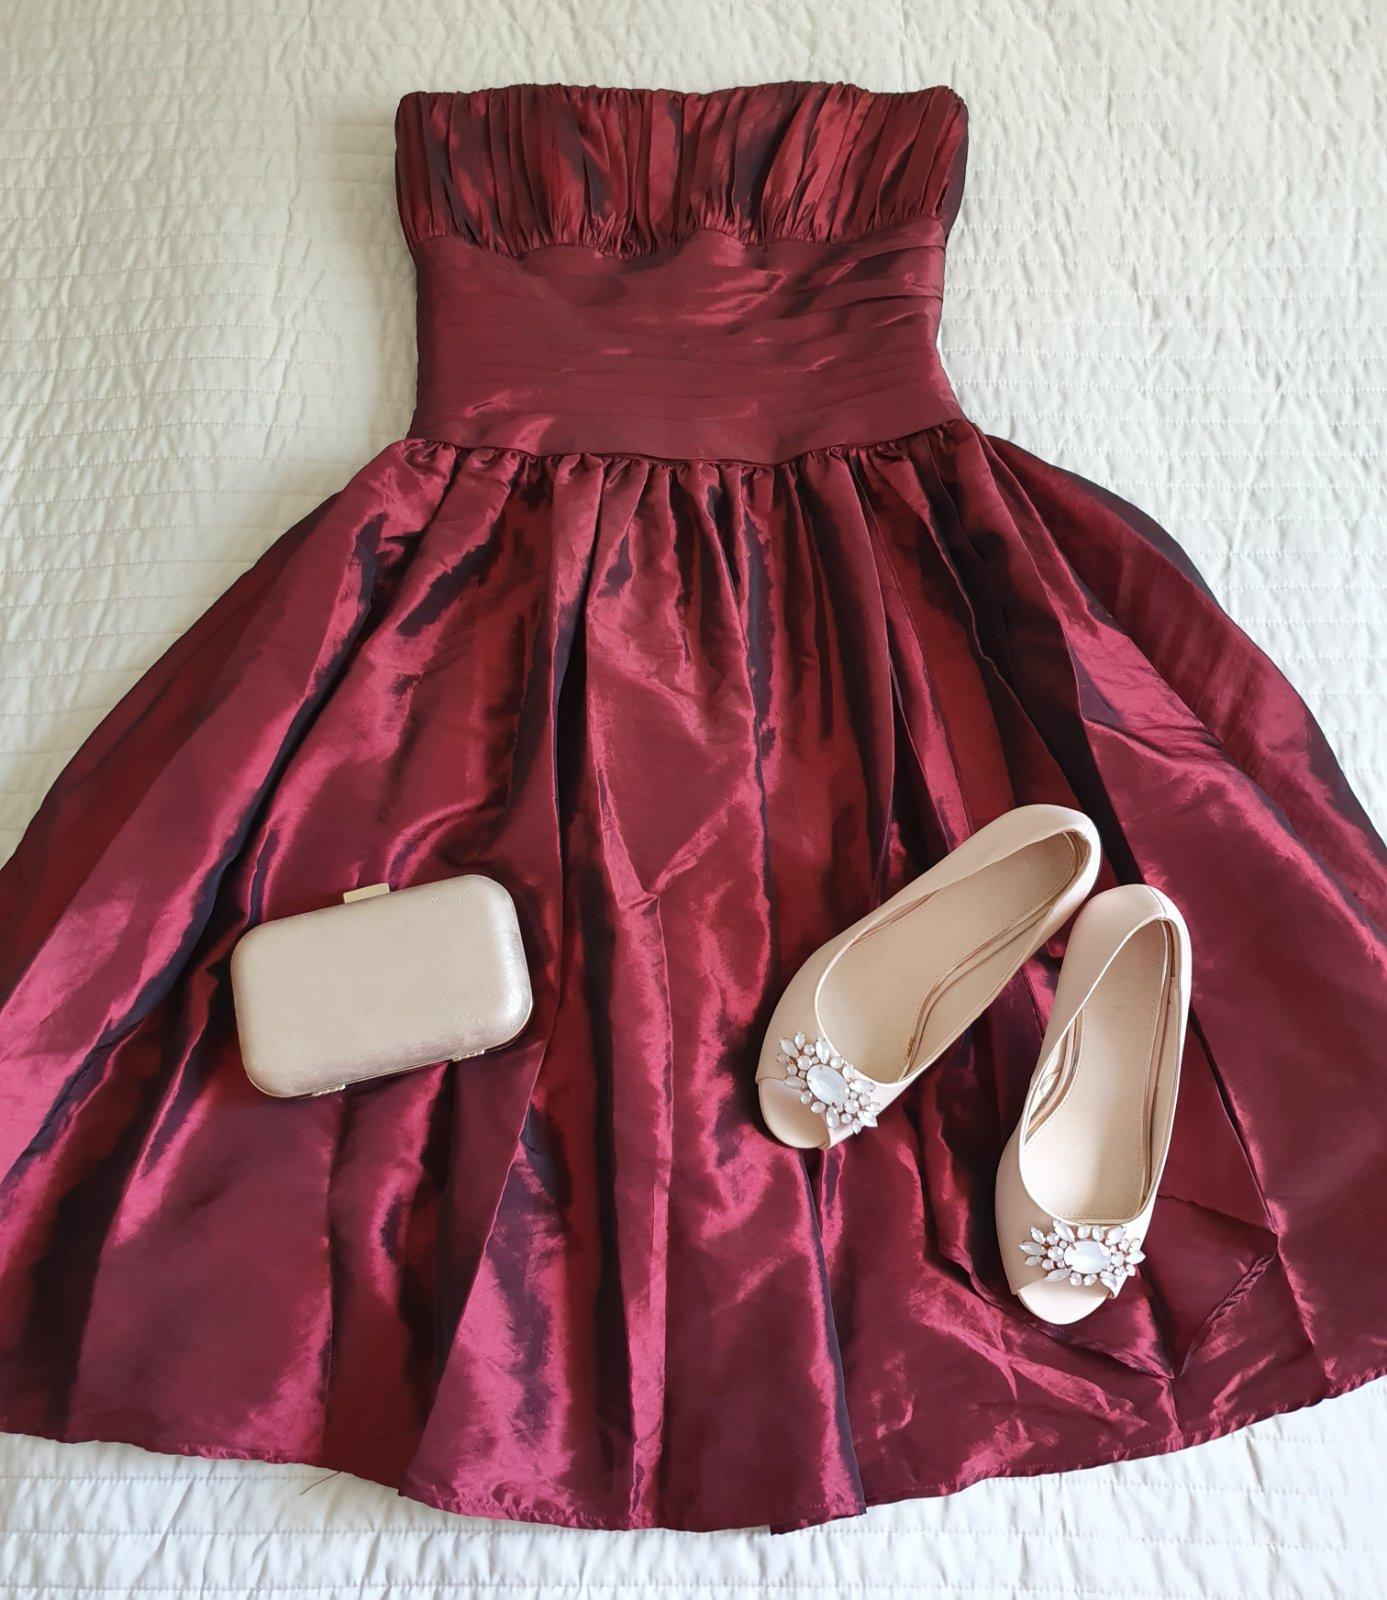 Nádherné spoločenské šaty - Obrázok č. 1